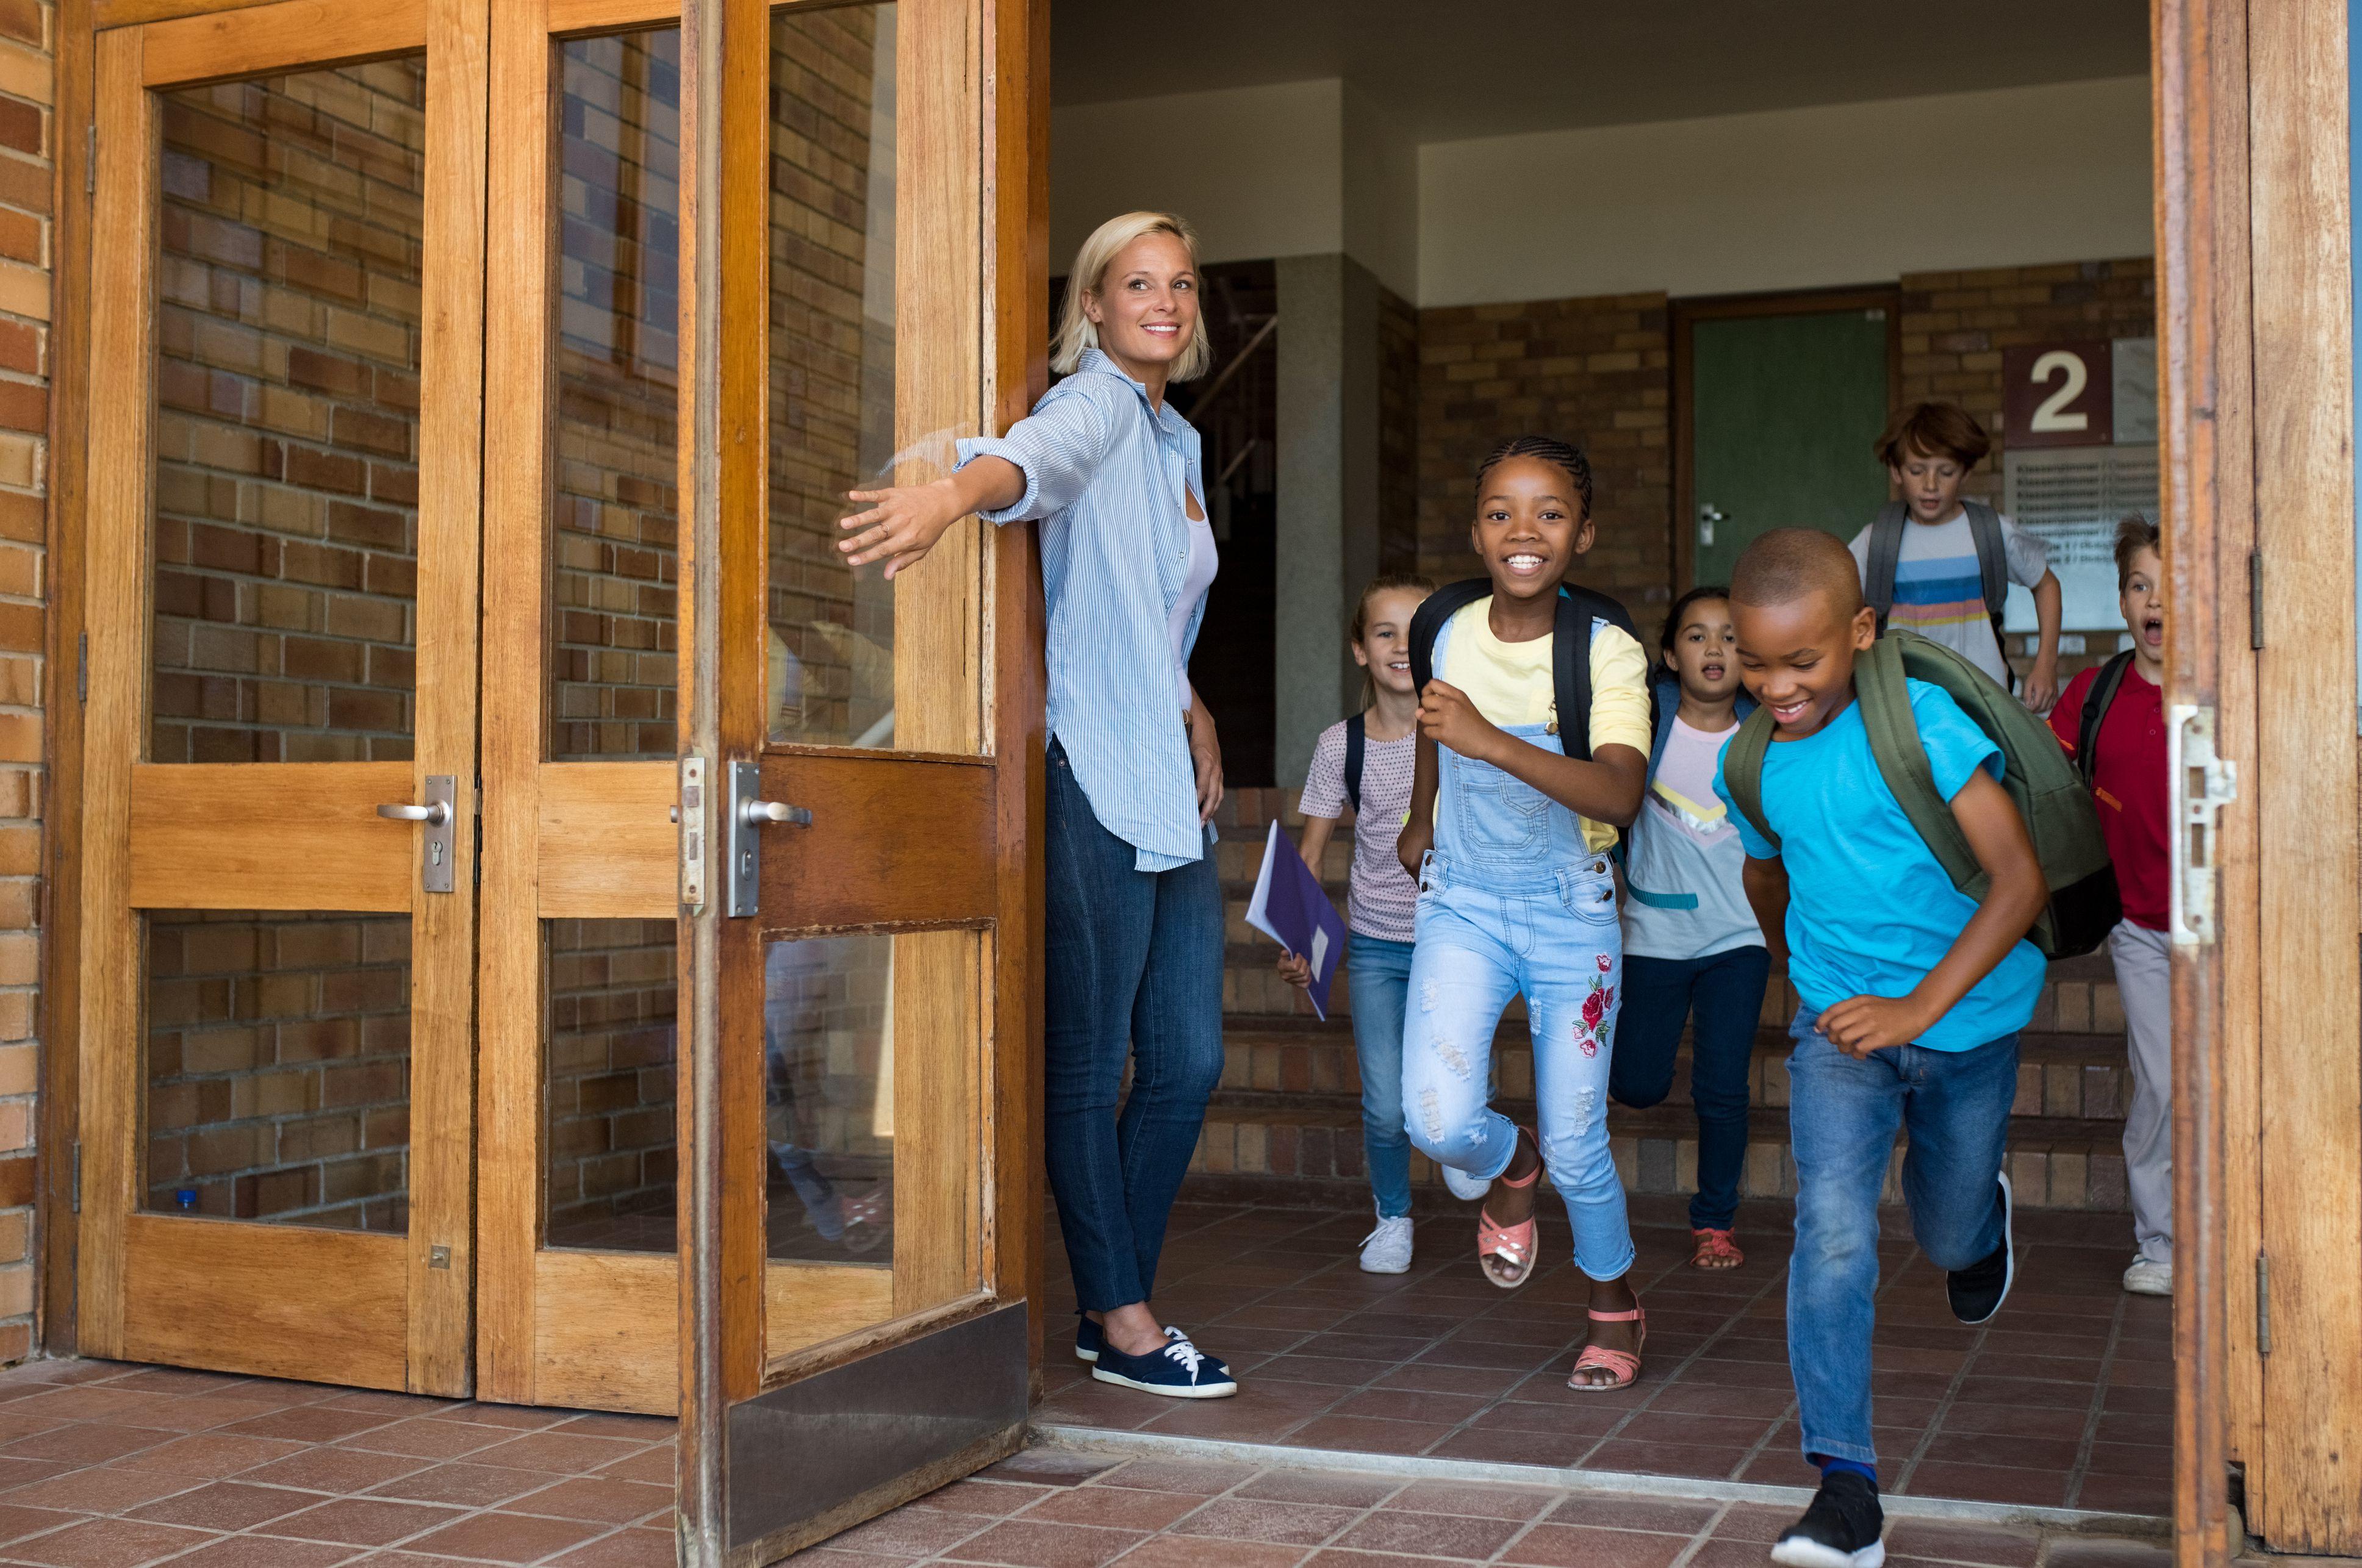 Top 10 Characteristics Of A Quality School